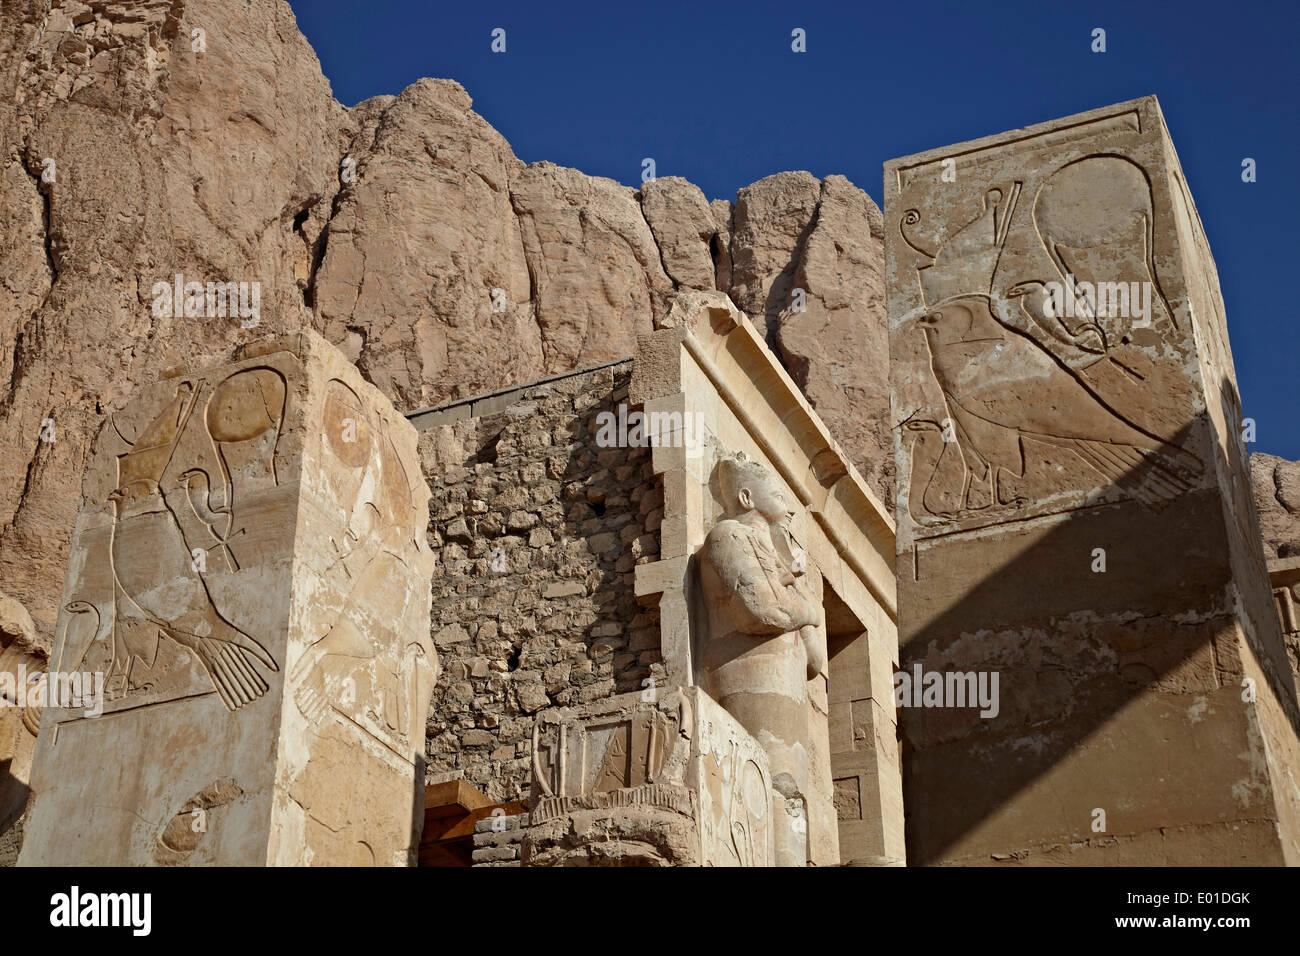 Colonnaded design of Hatshepsut temple, Temple of Queen Hatshepsut, Open air museum - Stock Image